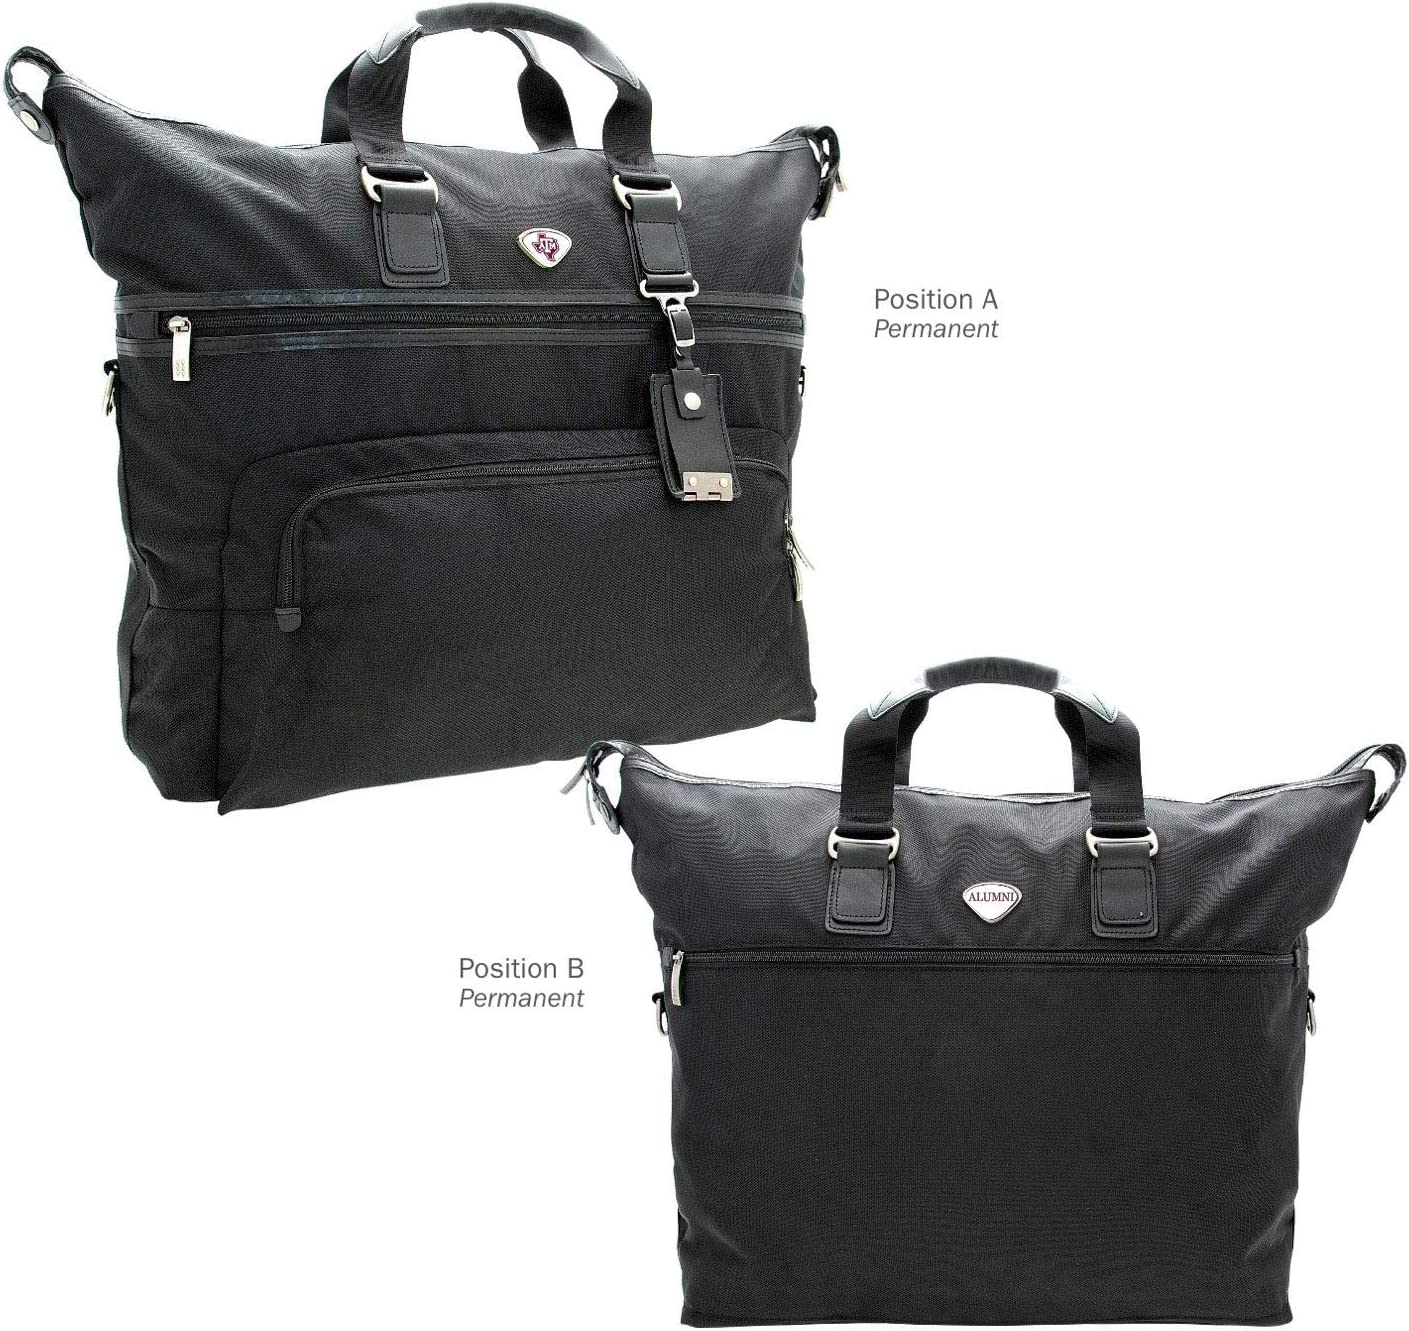 NCAA Texas A/&M Aggies Collegiate Executive Weekender Duffel BagCollegiate Executive Weekender Duffel Bag One Size Black